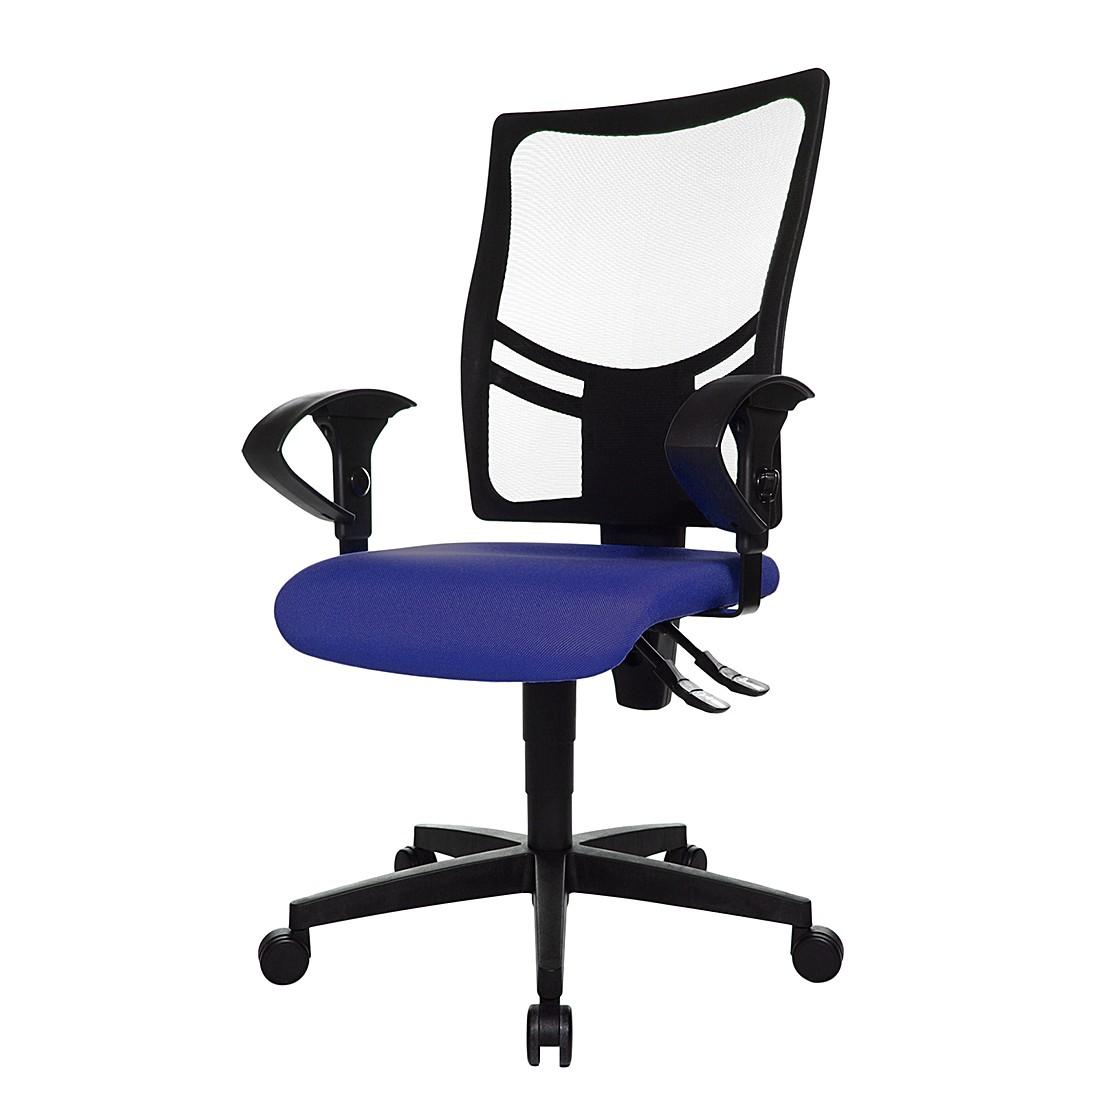 home24 Buerodrehstuhl Net Point 10   Büro > Bürostühle und Sessel    Blau   Topstar